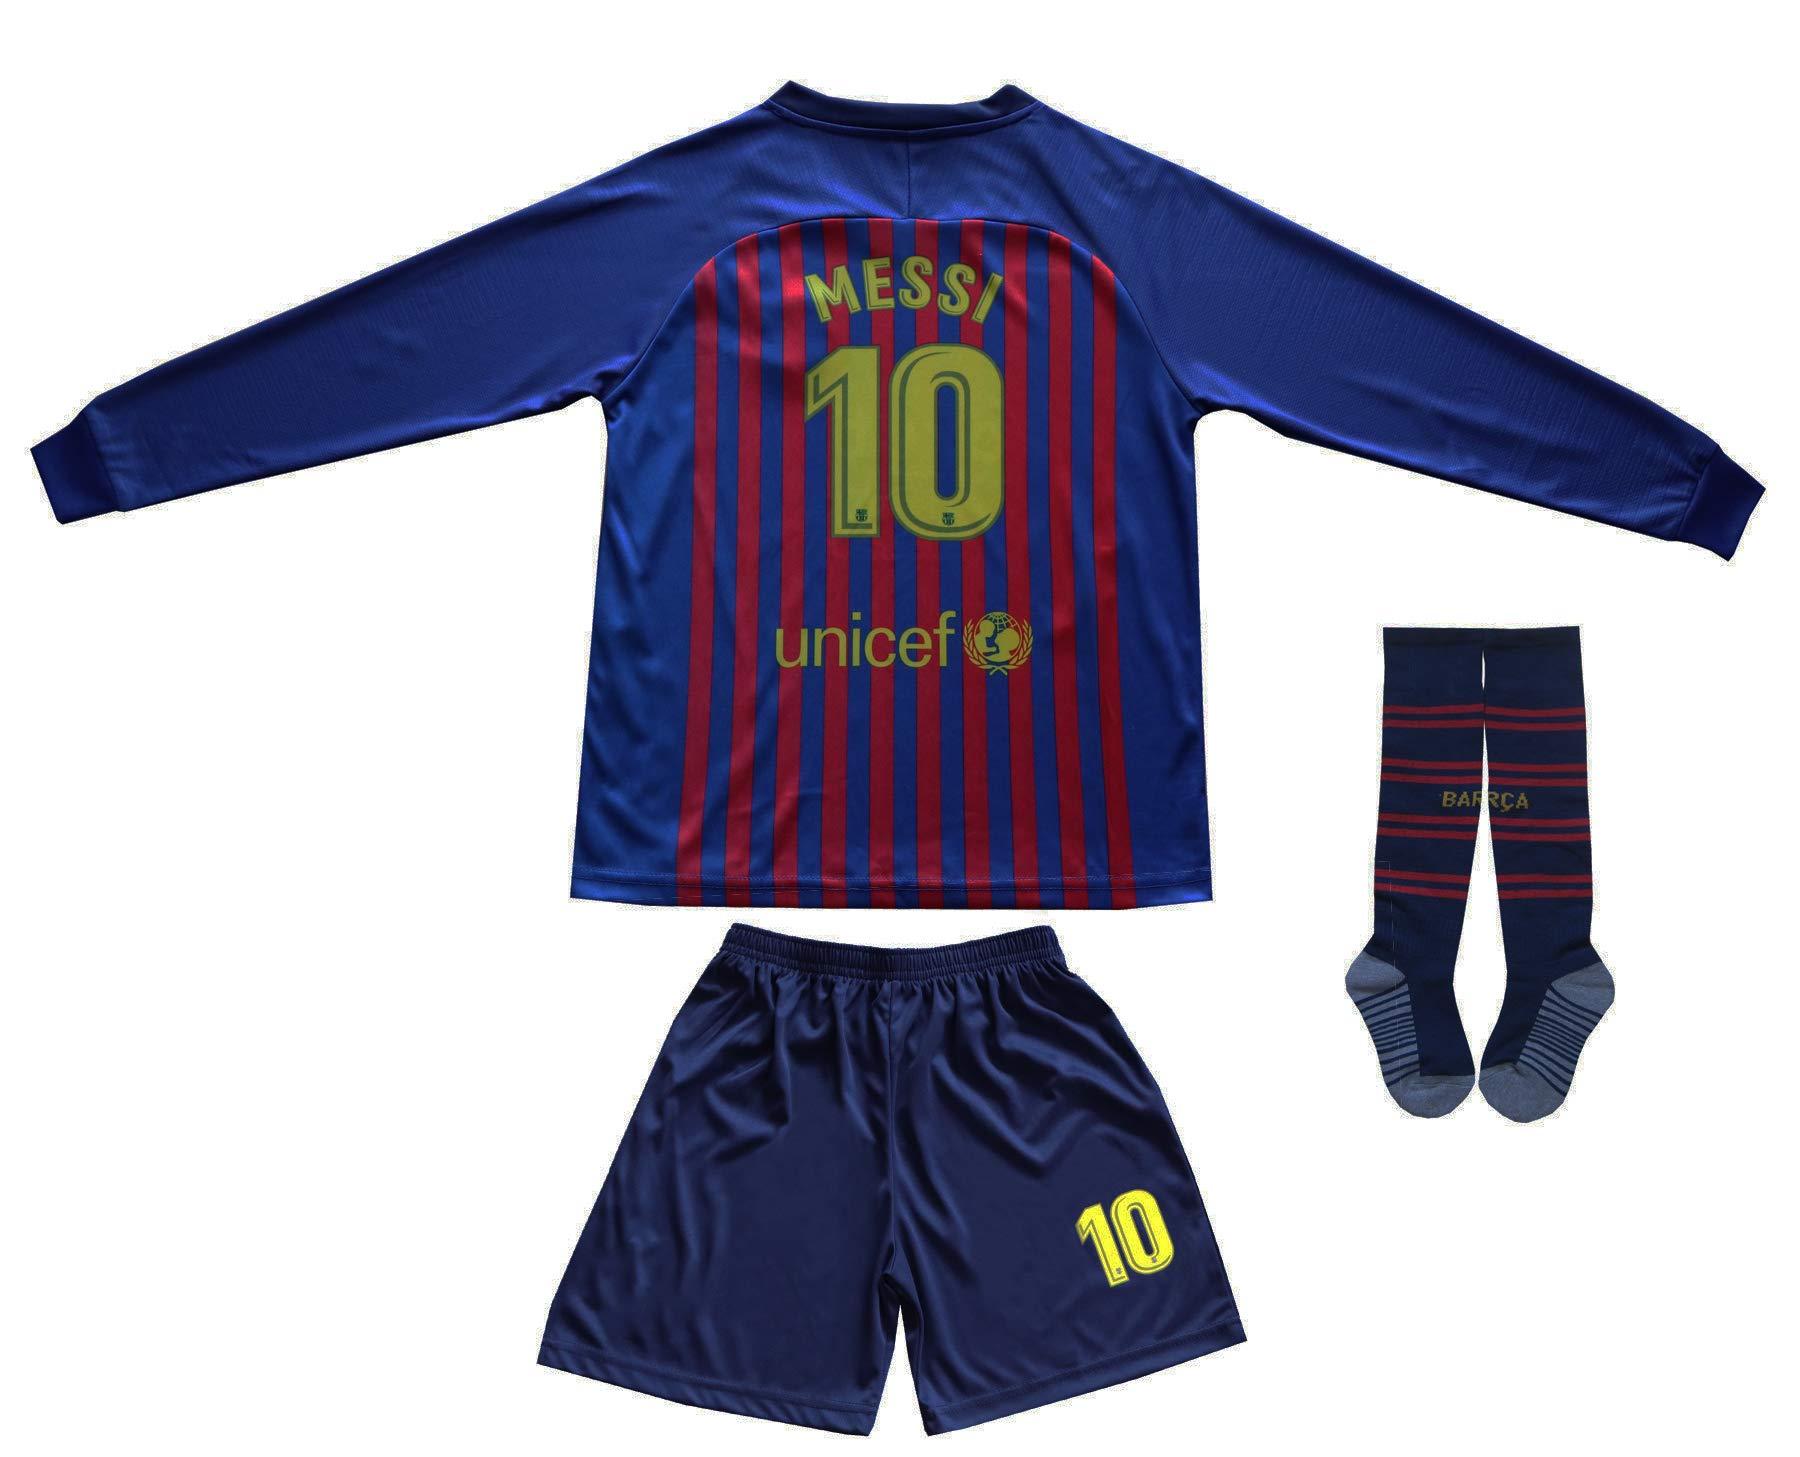 Da Games 青年运动装 Barcelona Messi 10 儿童家庭足球长袖运动衫/短裤足球袜套装